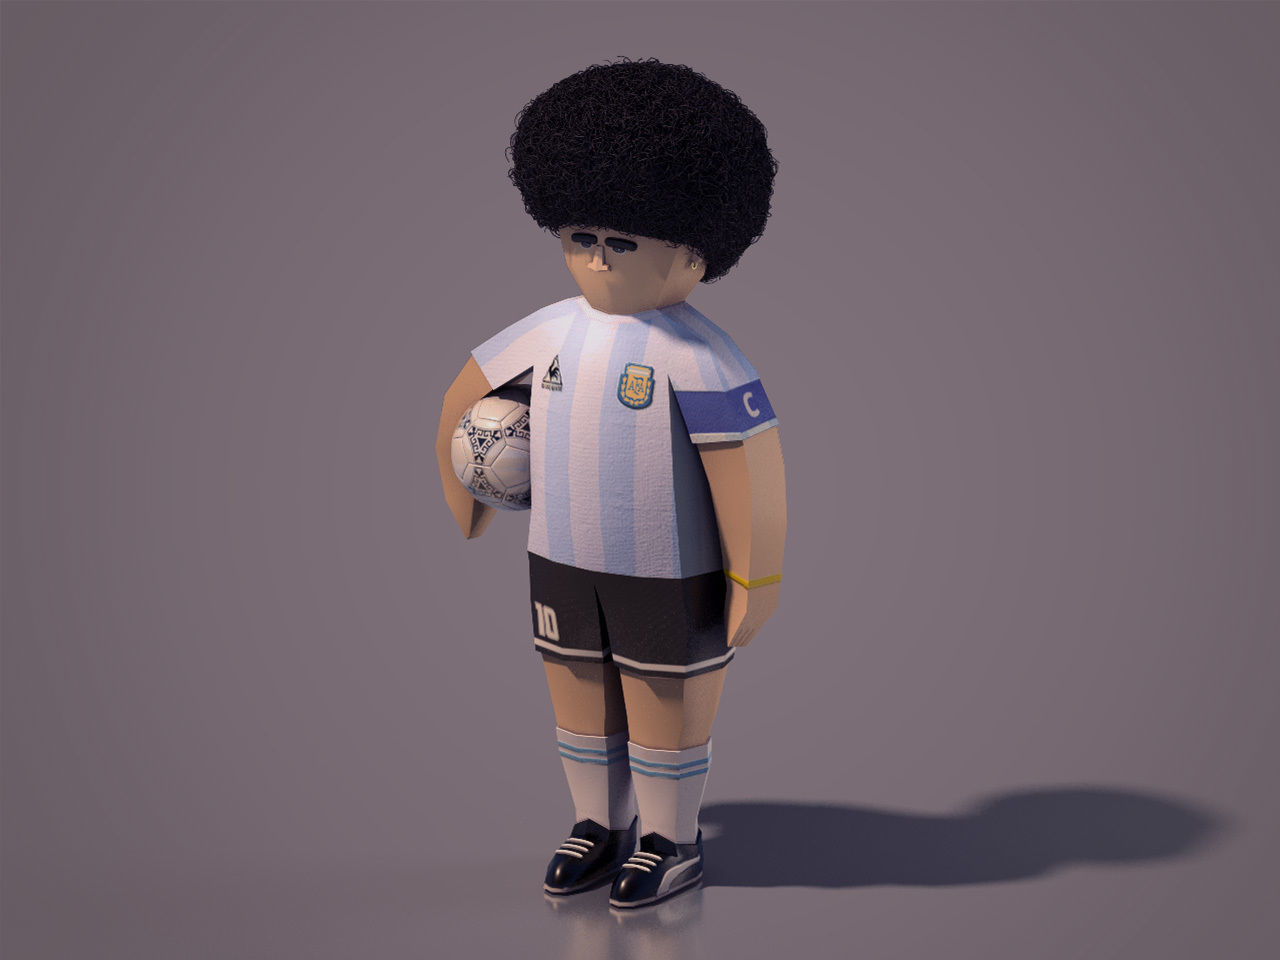 Diego Armando Maradona - Lowpoly